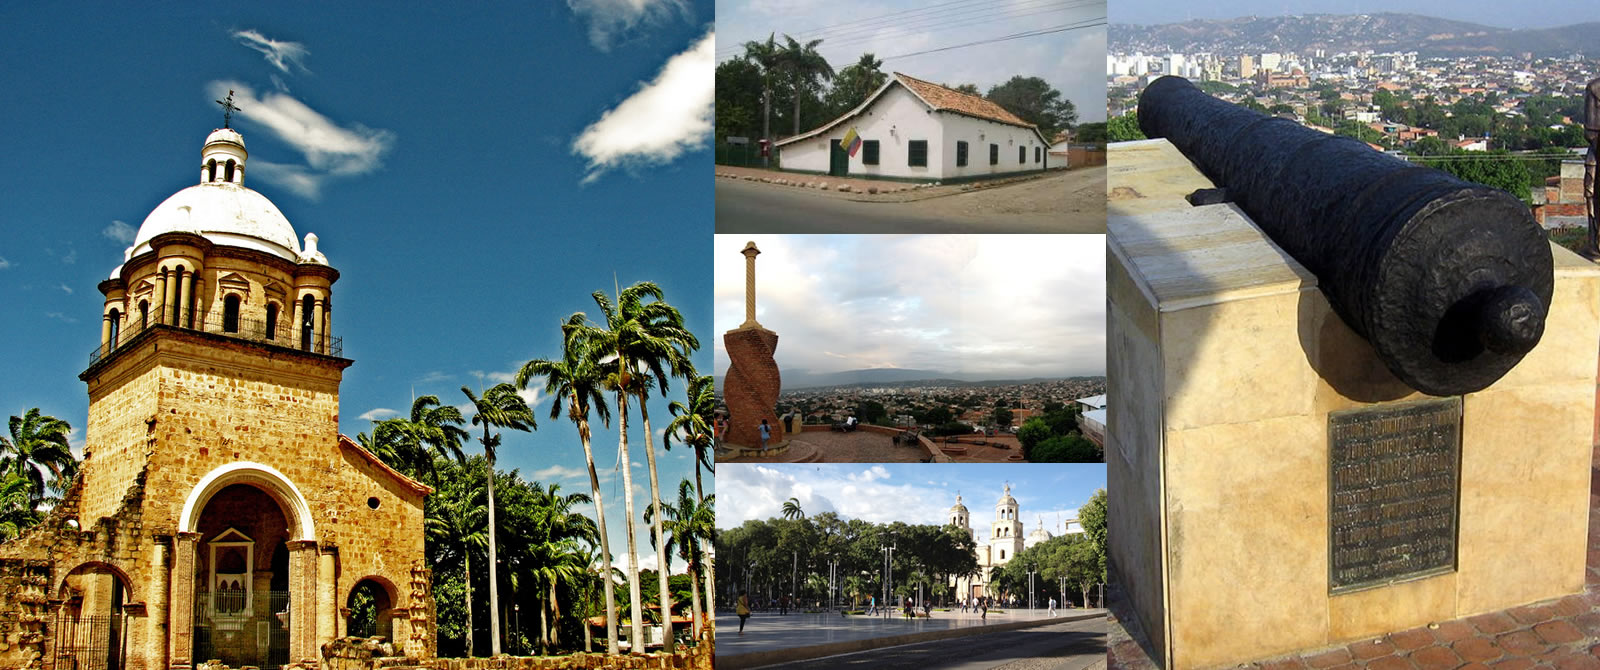 Cucuta city tour and shopping - 6 hours